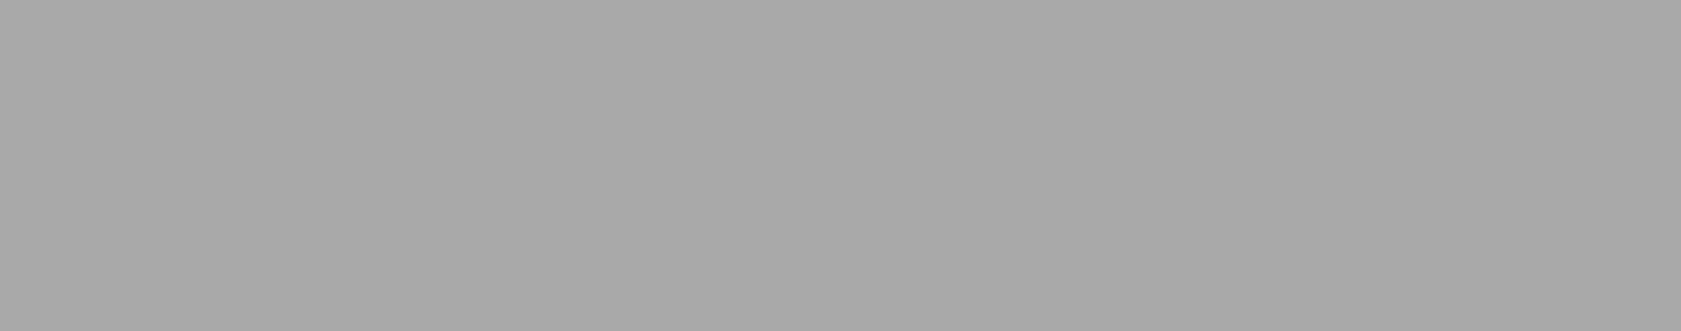 taubman-gray